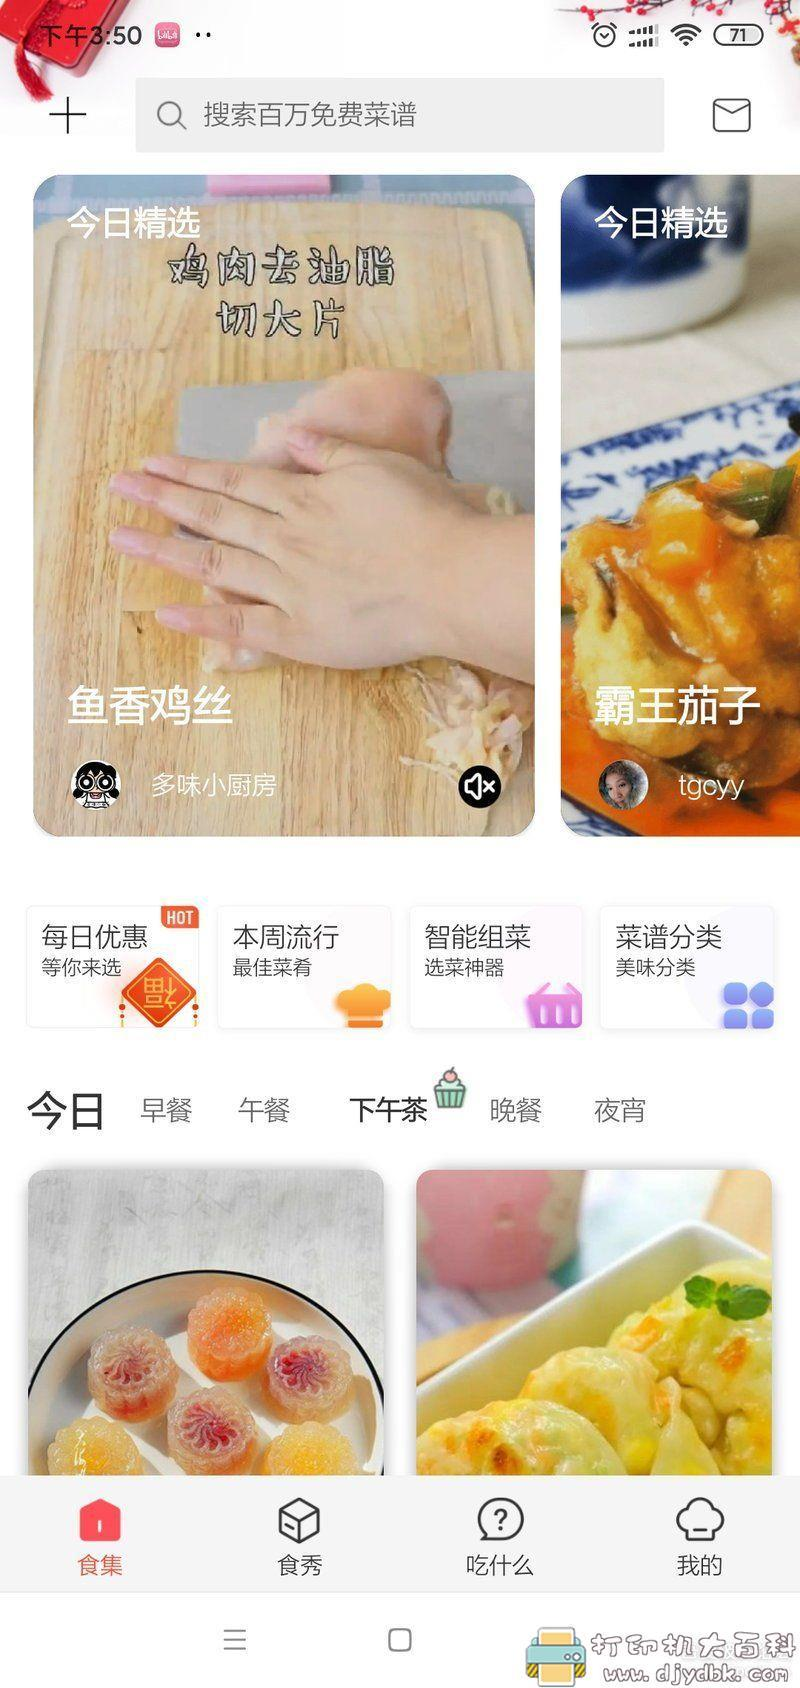 [Android]菜谱软件-美食杰 v7.2.2 去广告版 配图 No.2